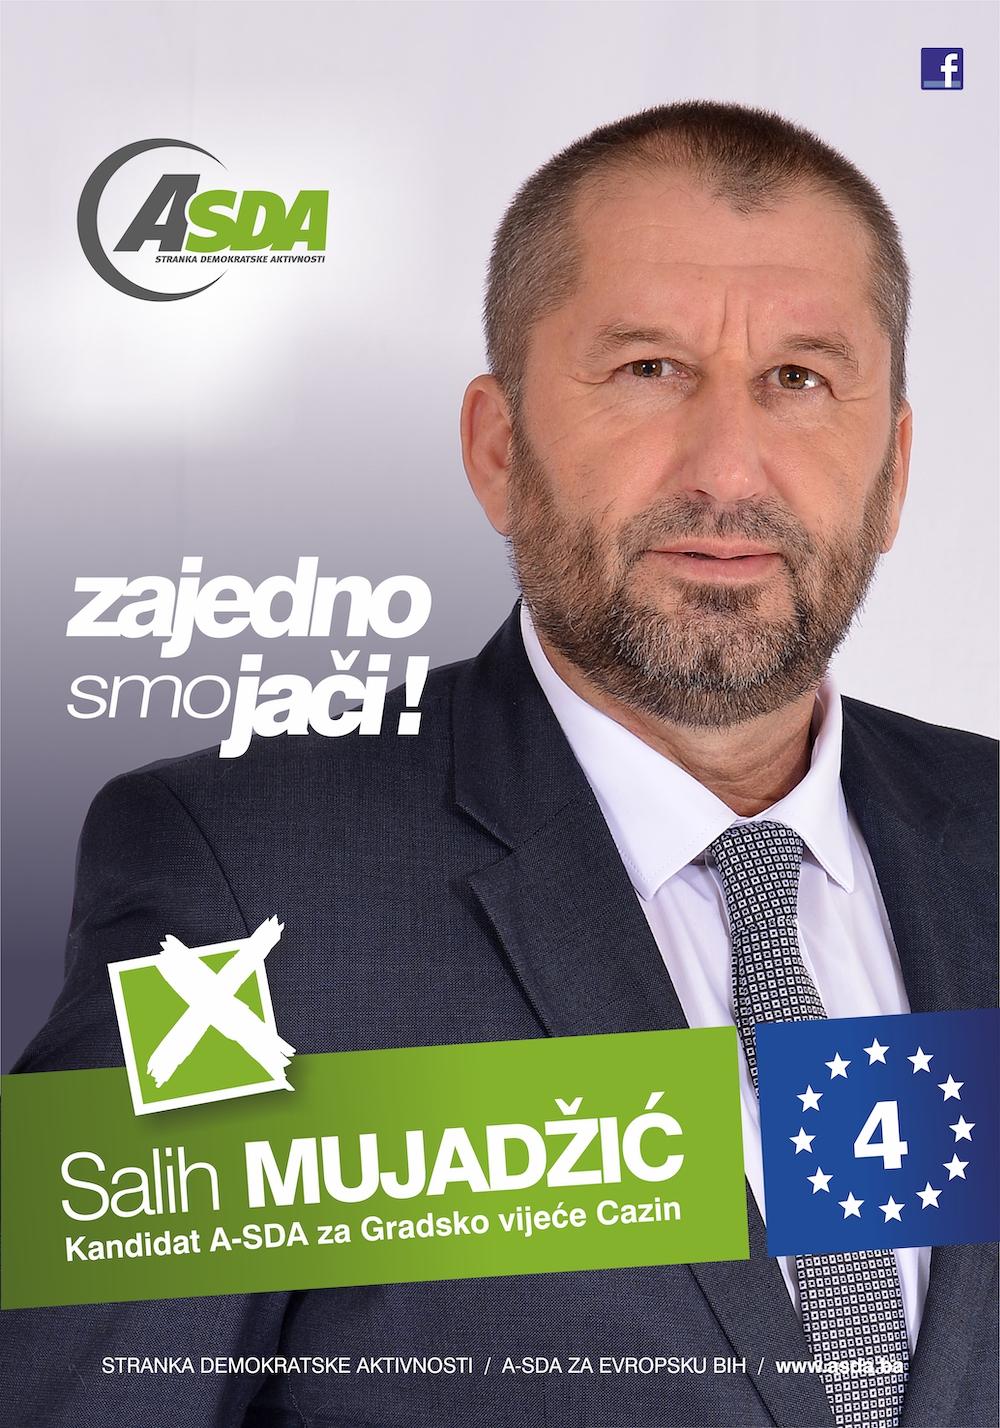 Salih Mujadžić